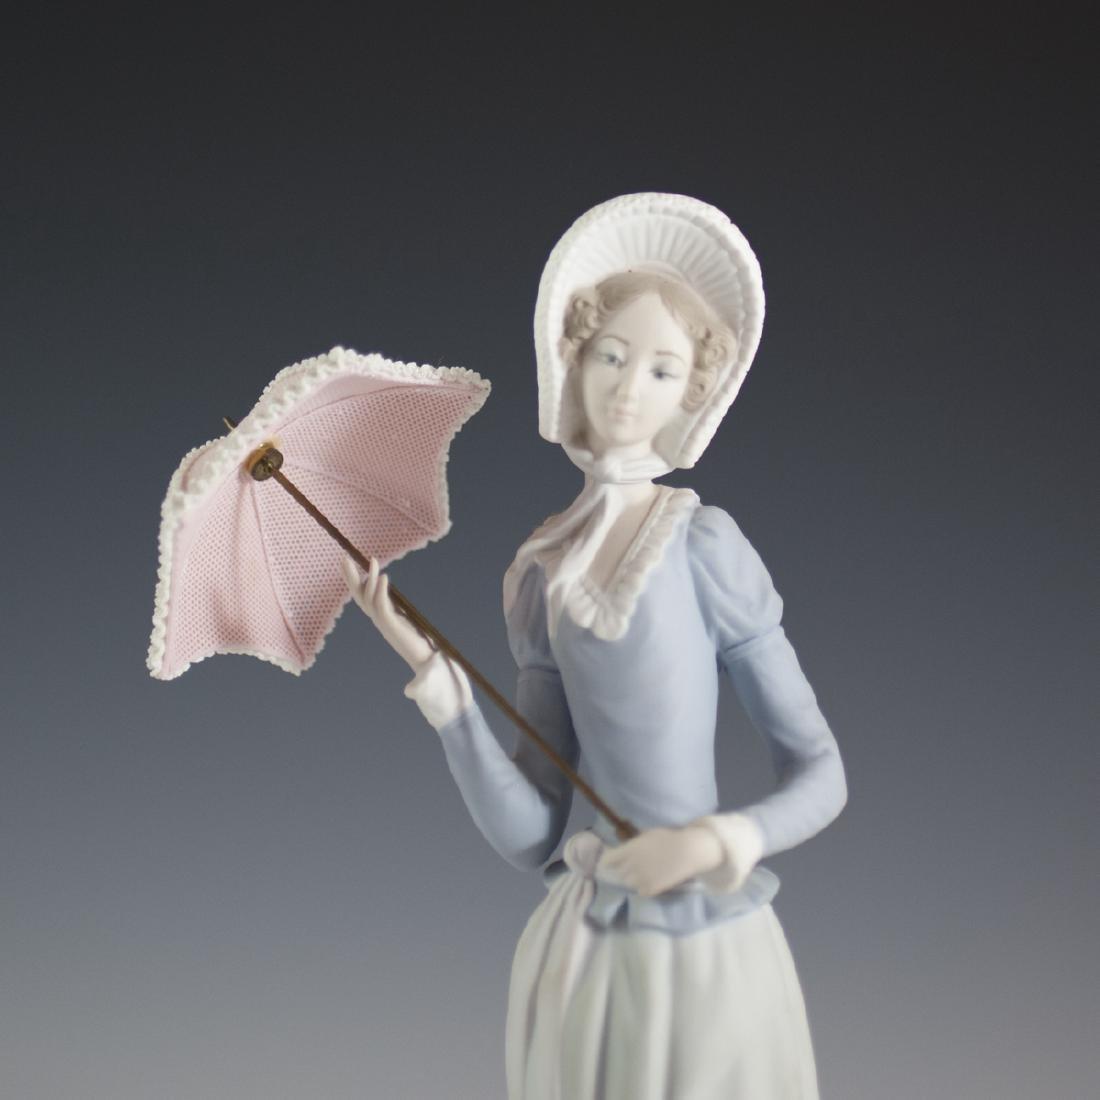 "Lladro Porcelain ""Aranjuez Little Lady"" Figurine - 2"